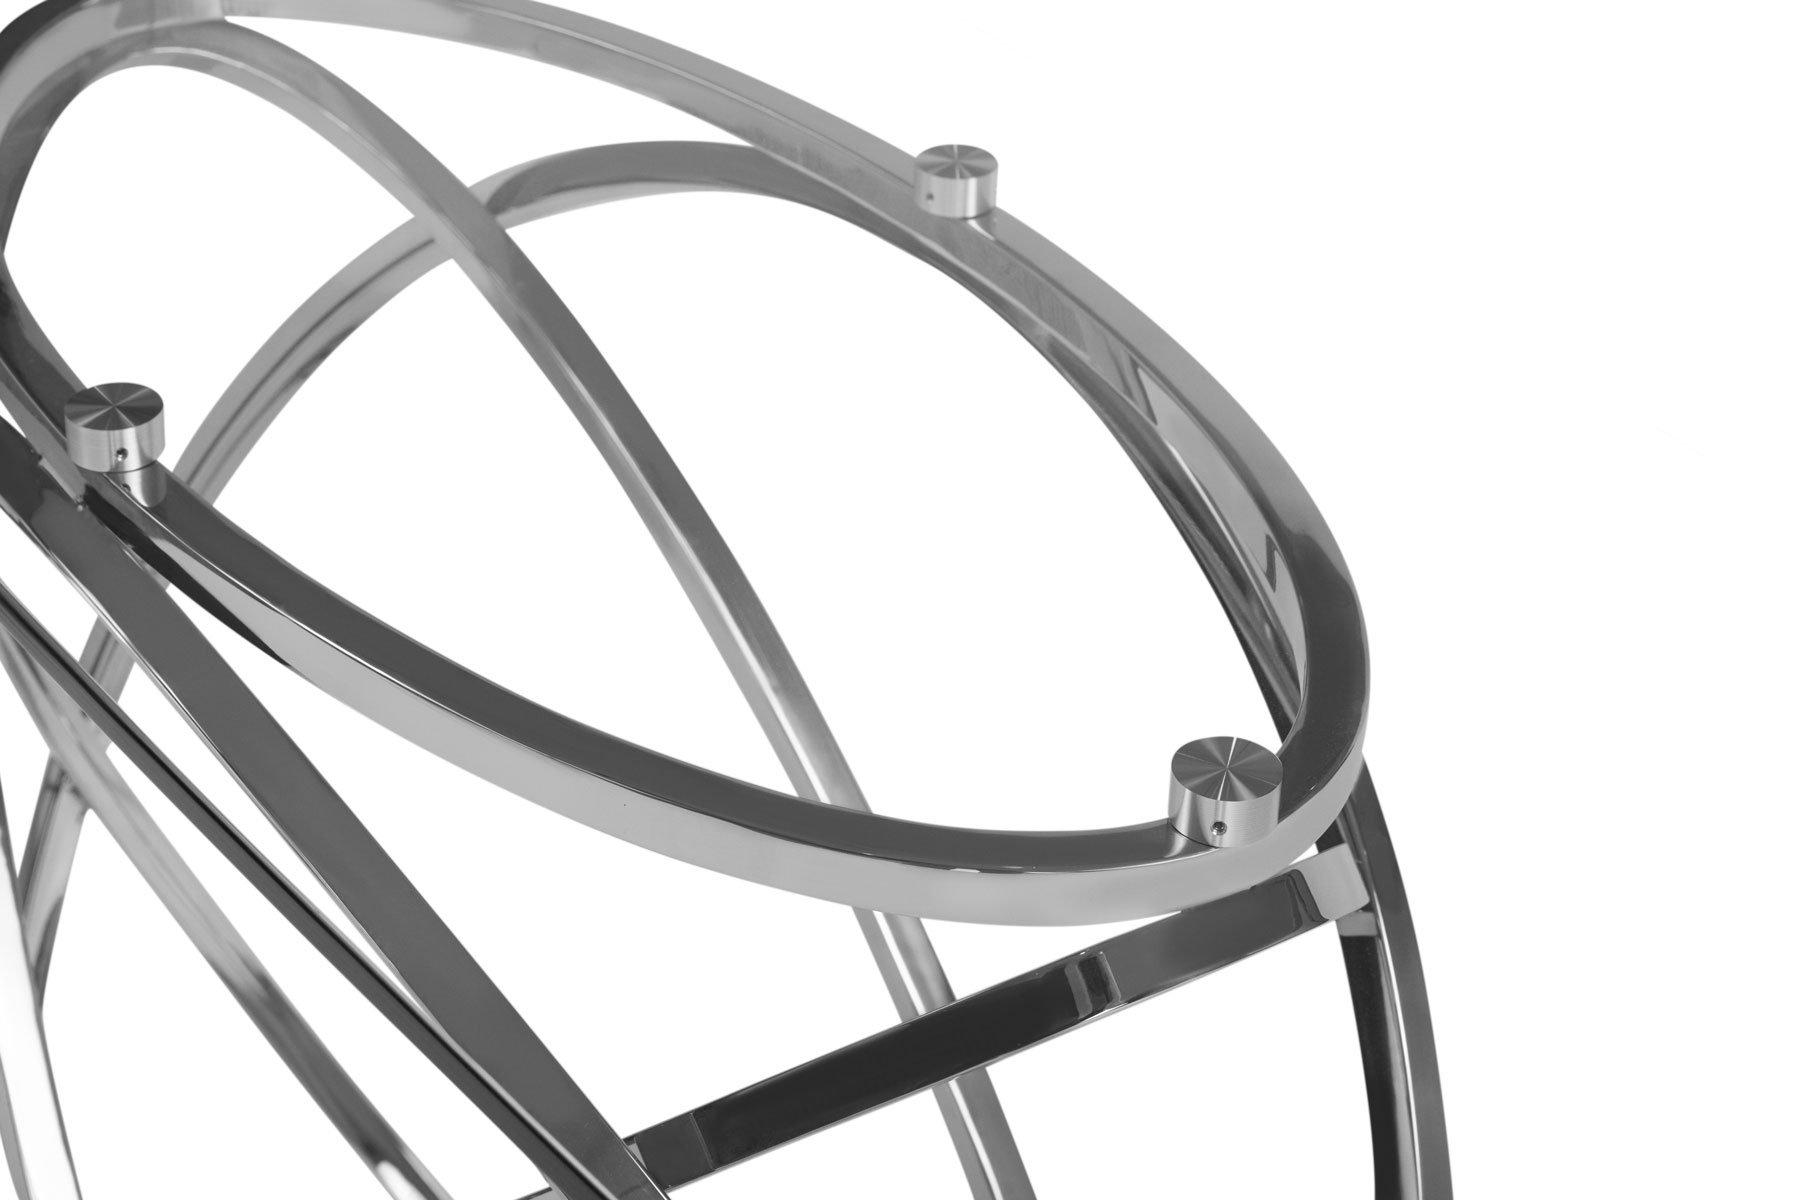 CATALANO-SKU-MHE351400-TOKYO-SOFA-TABLE-ST-STEEL-GLASS52018-1-1